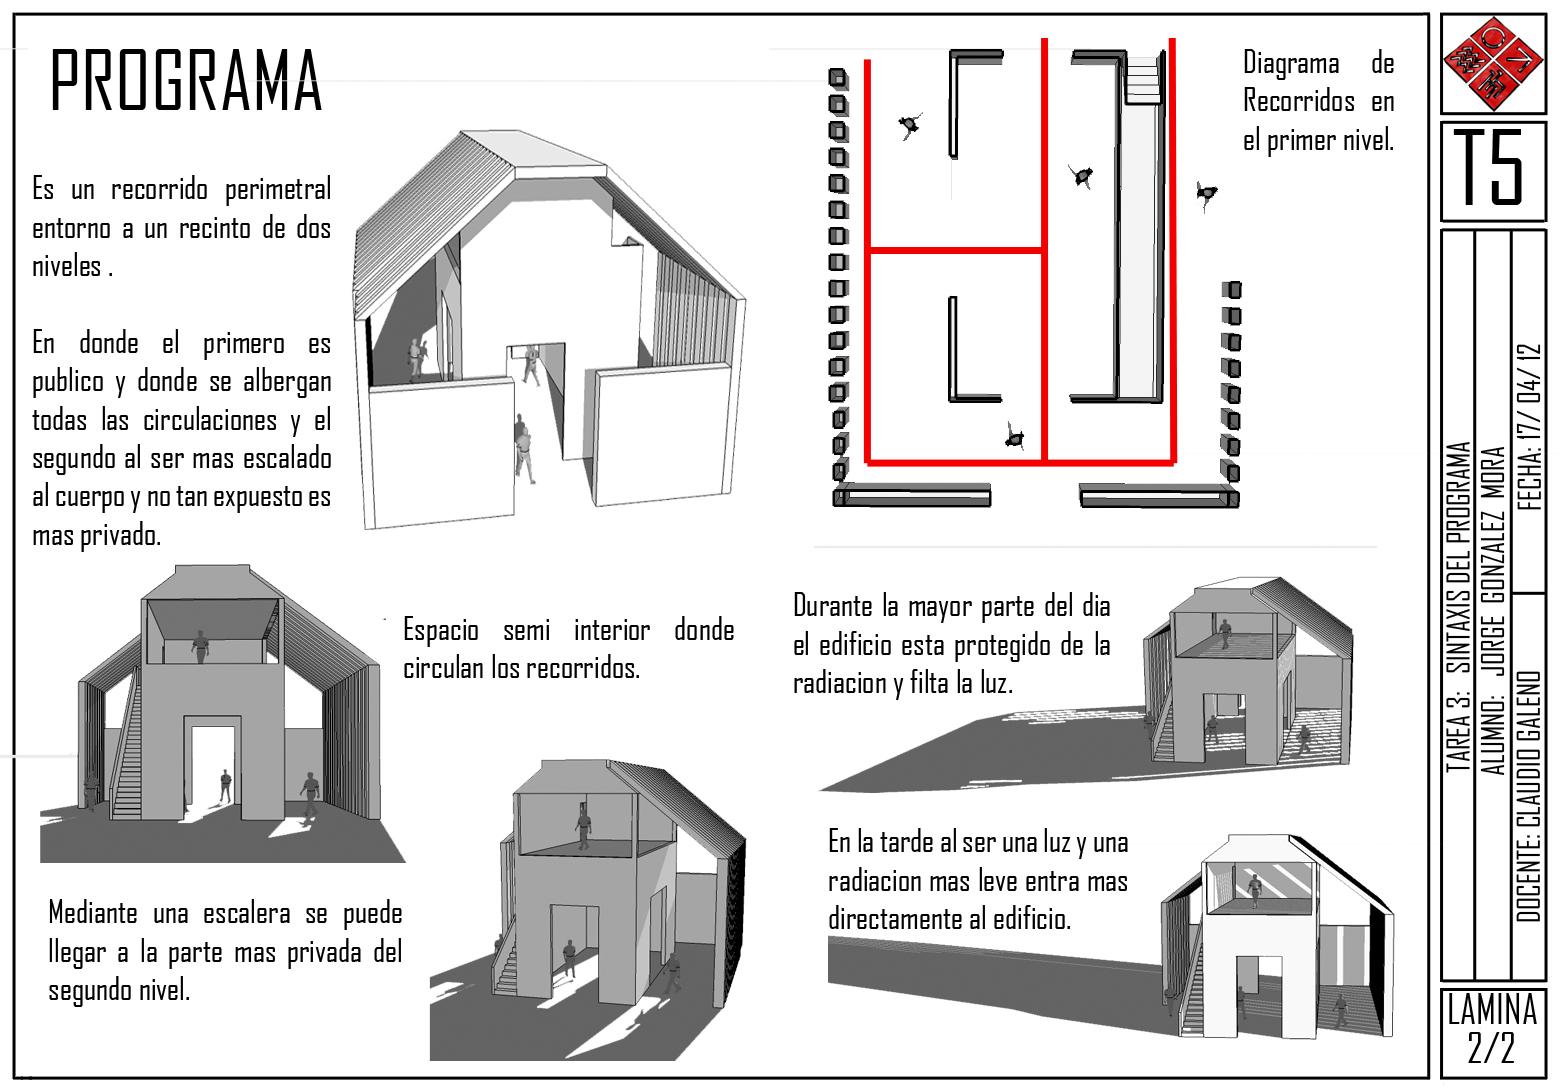 Taller de arquitectura 5 lenguaje 1er semestre de 2012 for Programa arquitectonico